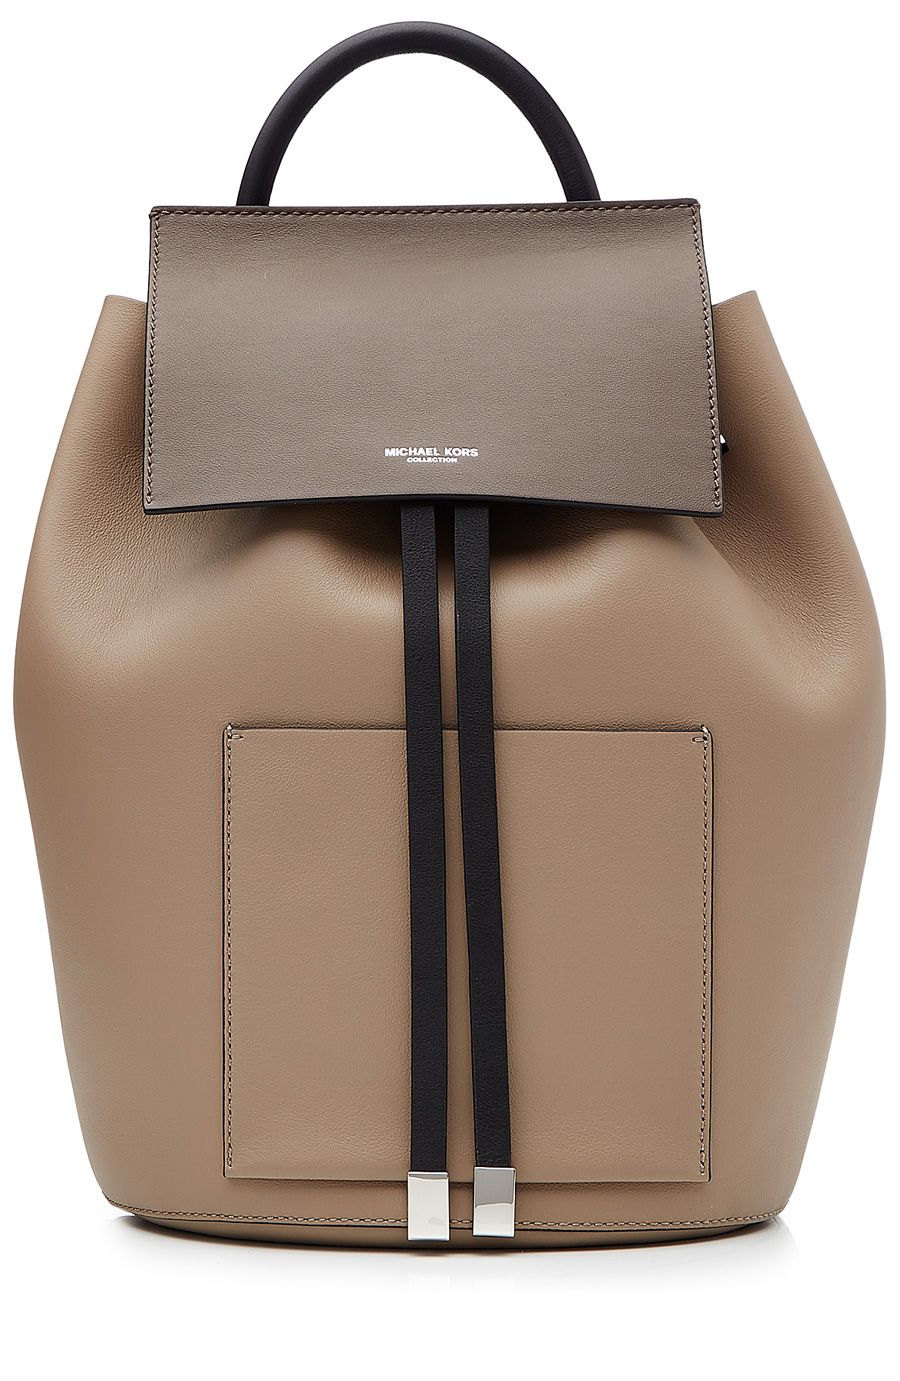 06adc7efc7b2 MICHAEL KORS Leather Backpack.  michaelkors  bags  lining  backpacks  suede   metallic